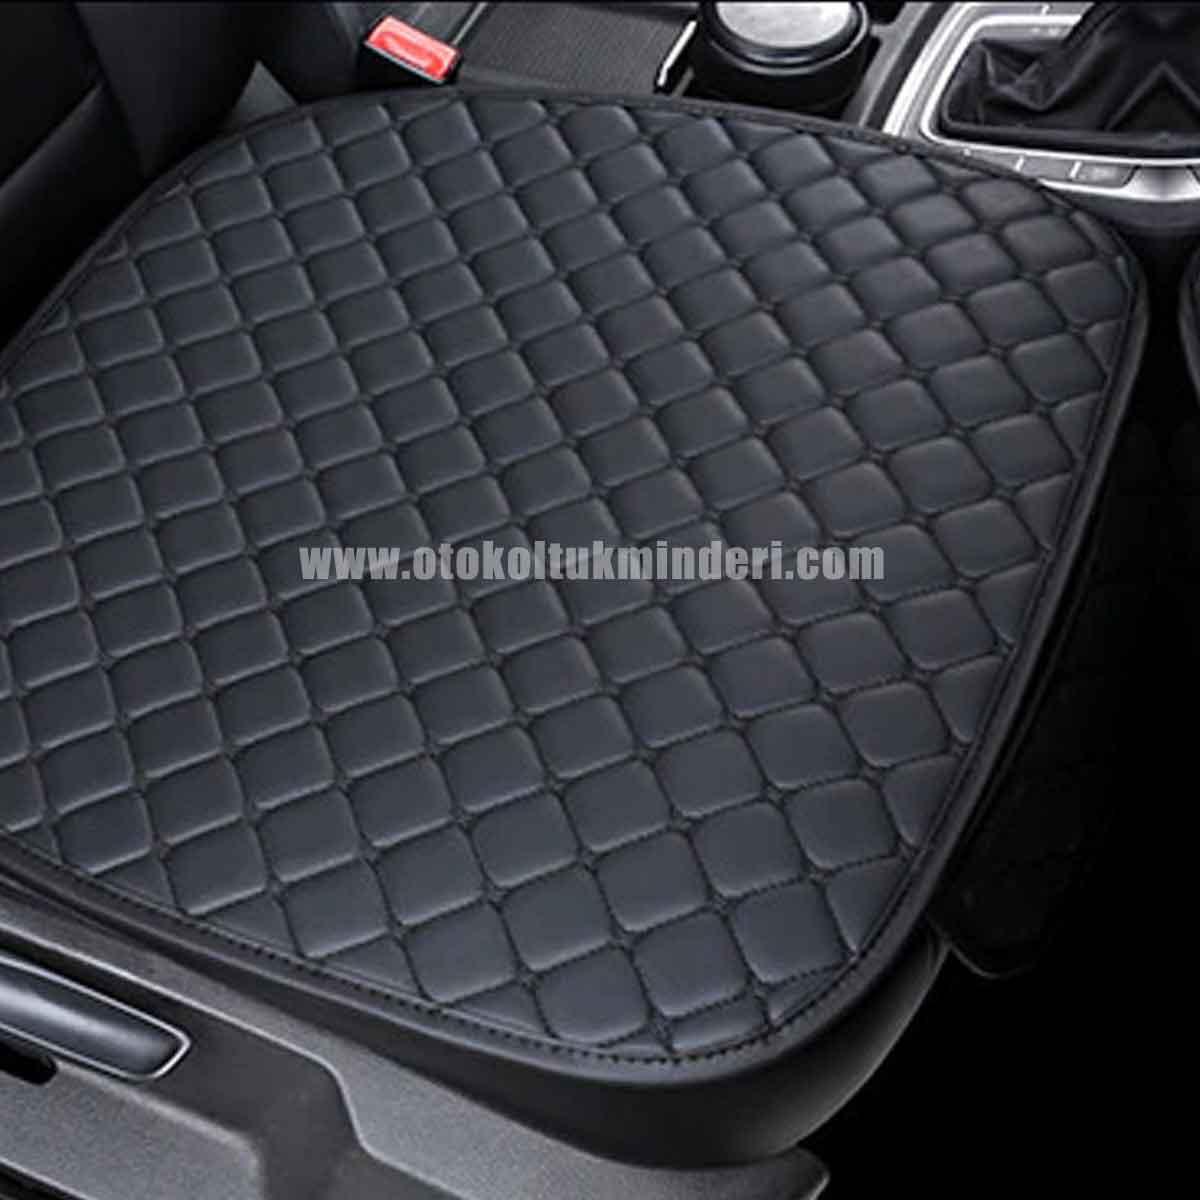 Hyundai oto koltuk kılıfı - Hyundai Koltuk minderi Siyah Deri Cepli